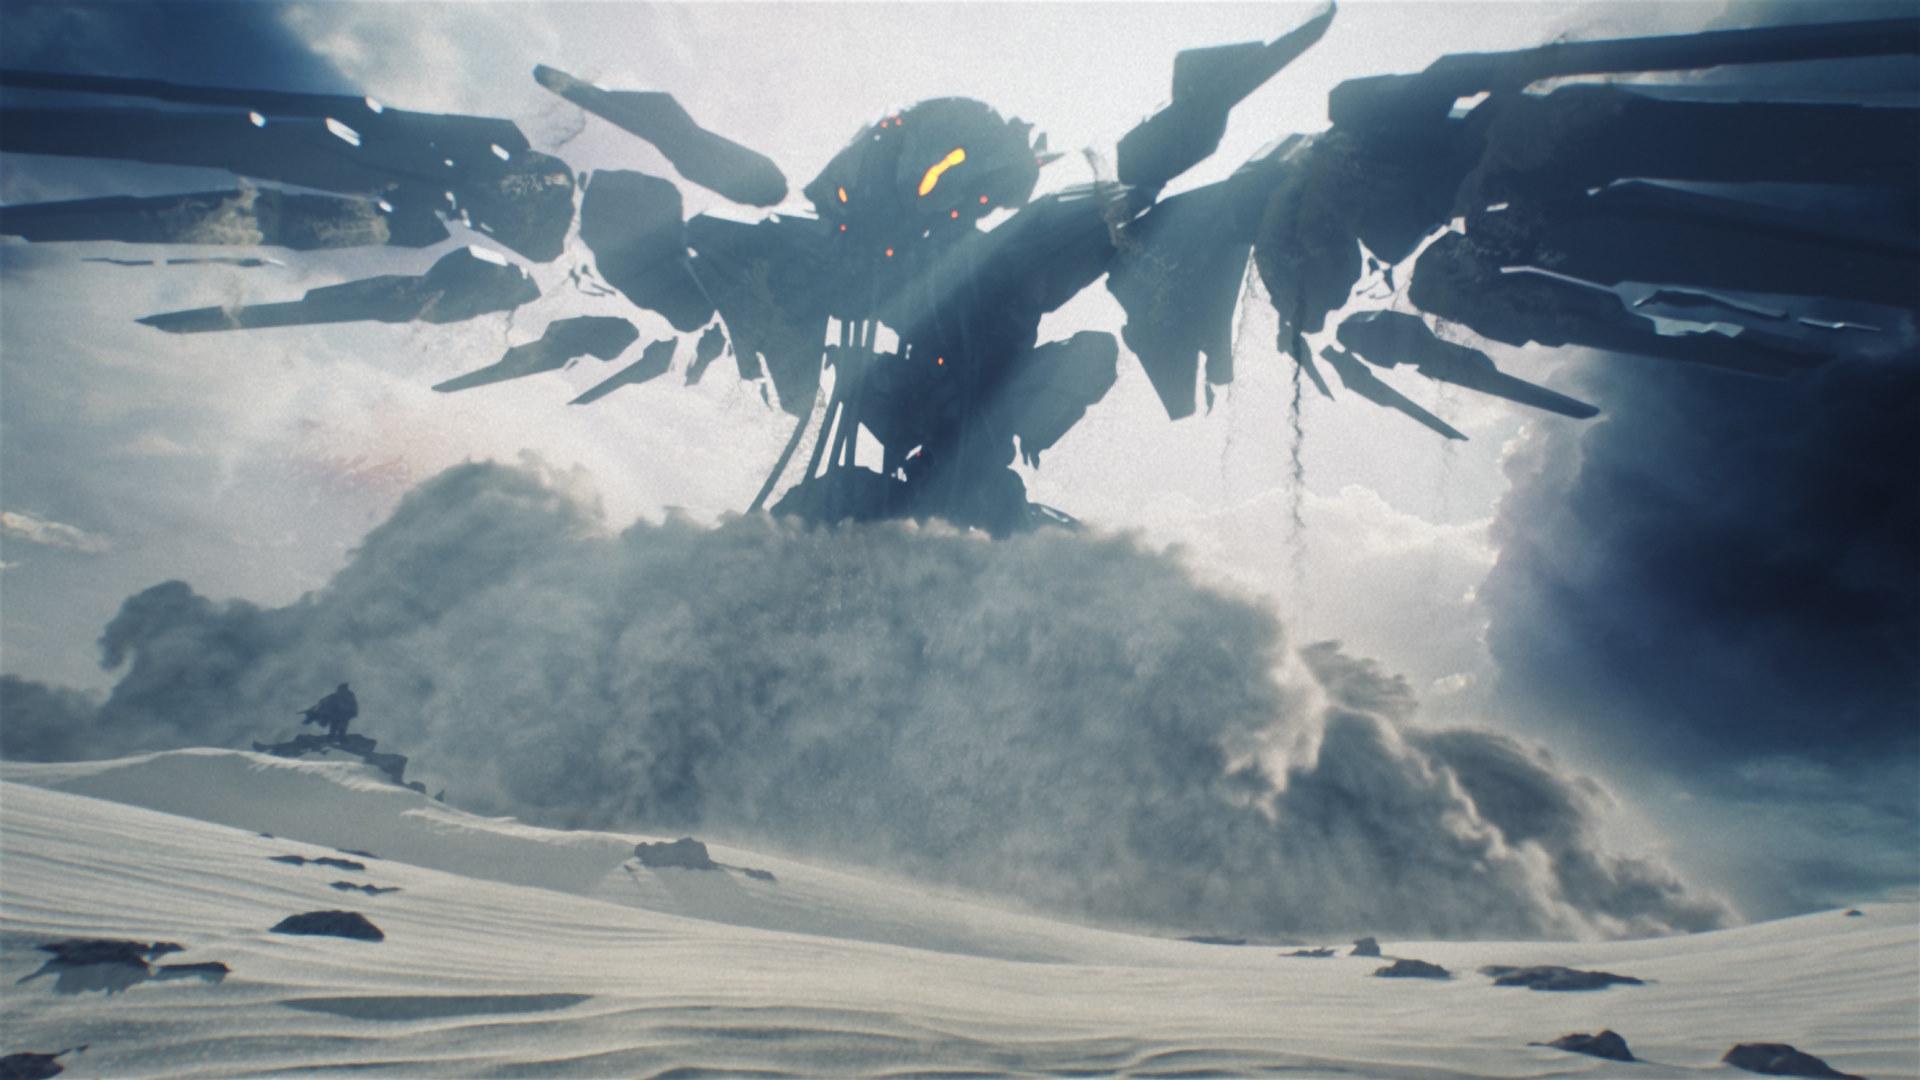 Halo 5 Guardians wallpaper 4 1920x1080